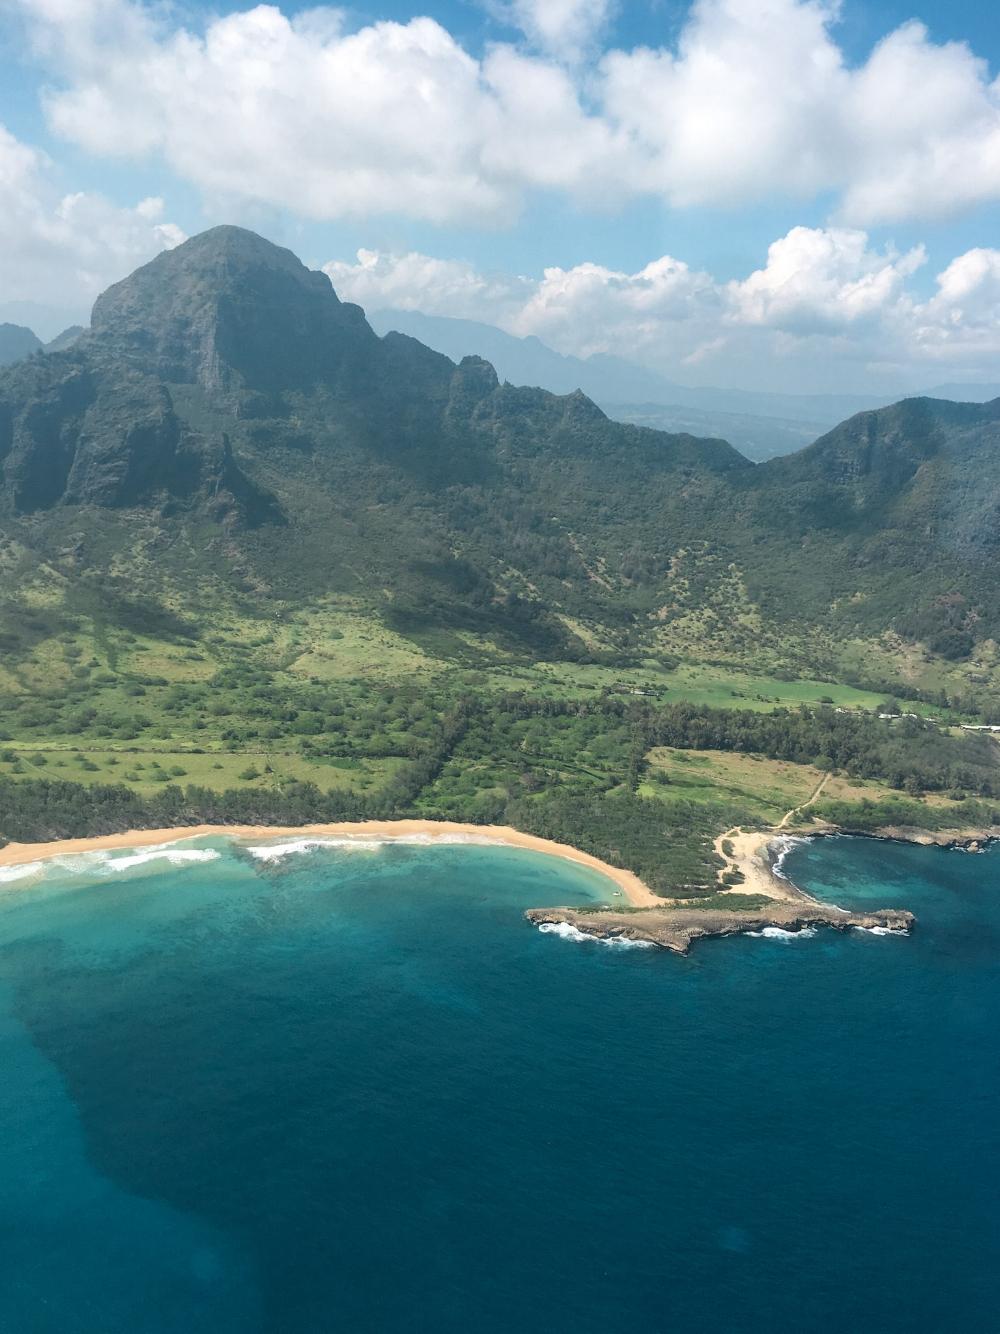 curio.trips.hawaii.kauai.coast.beach.jpg